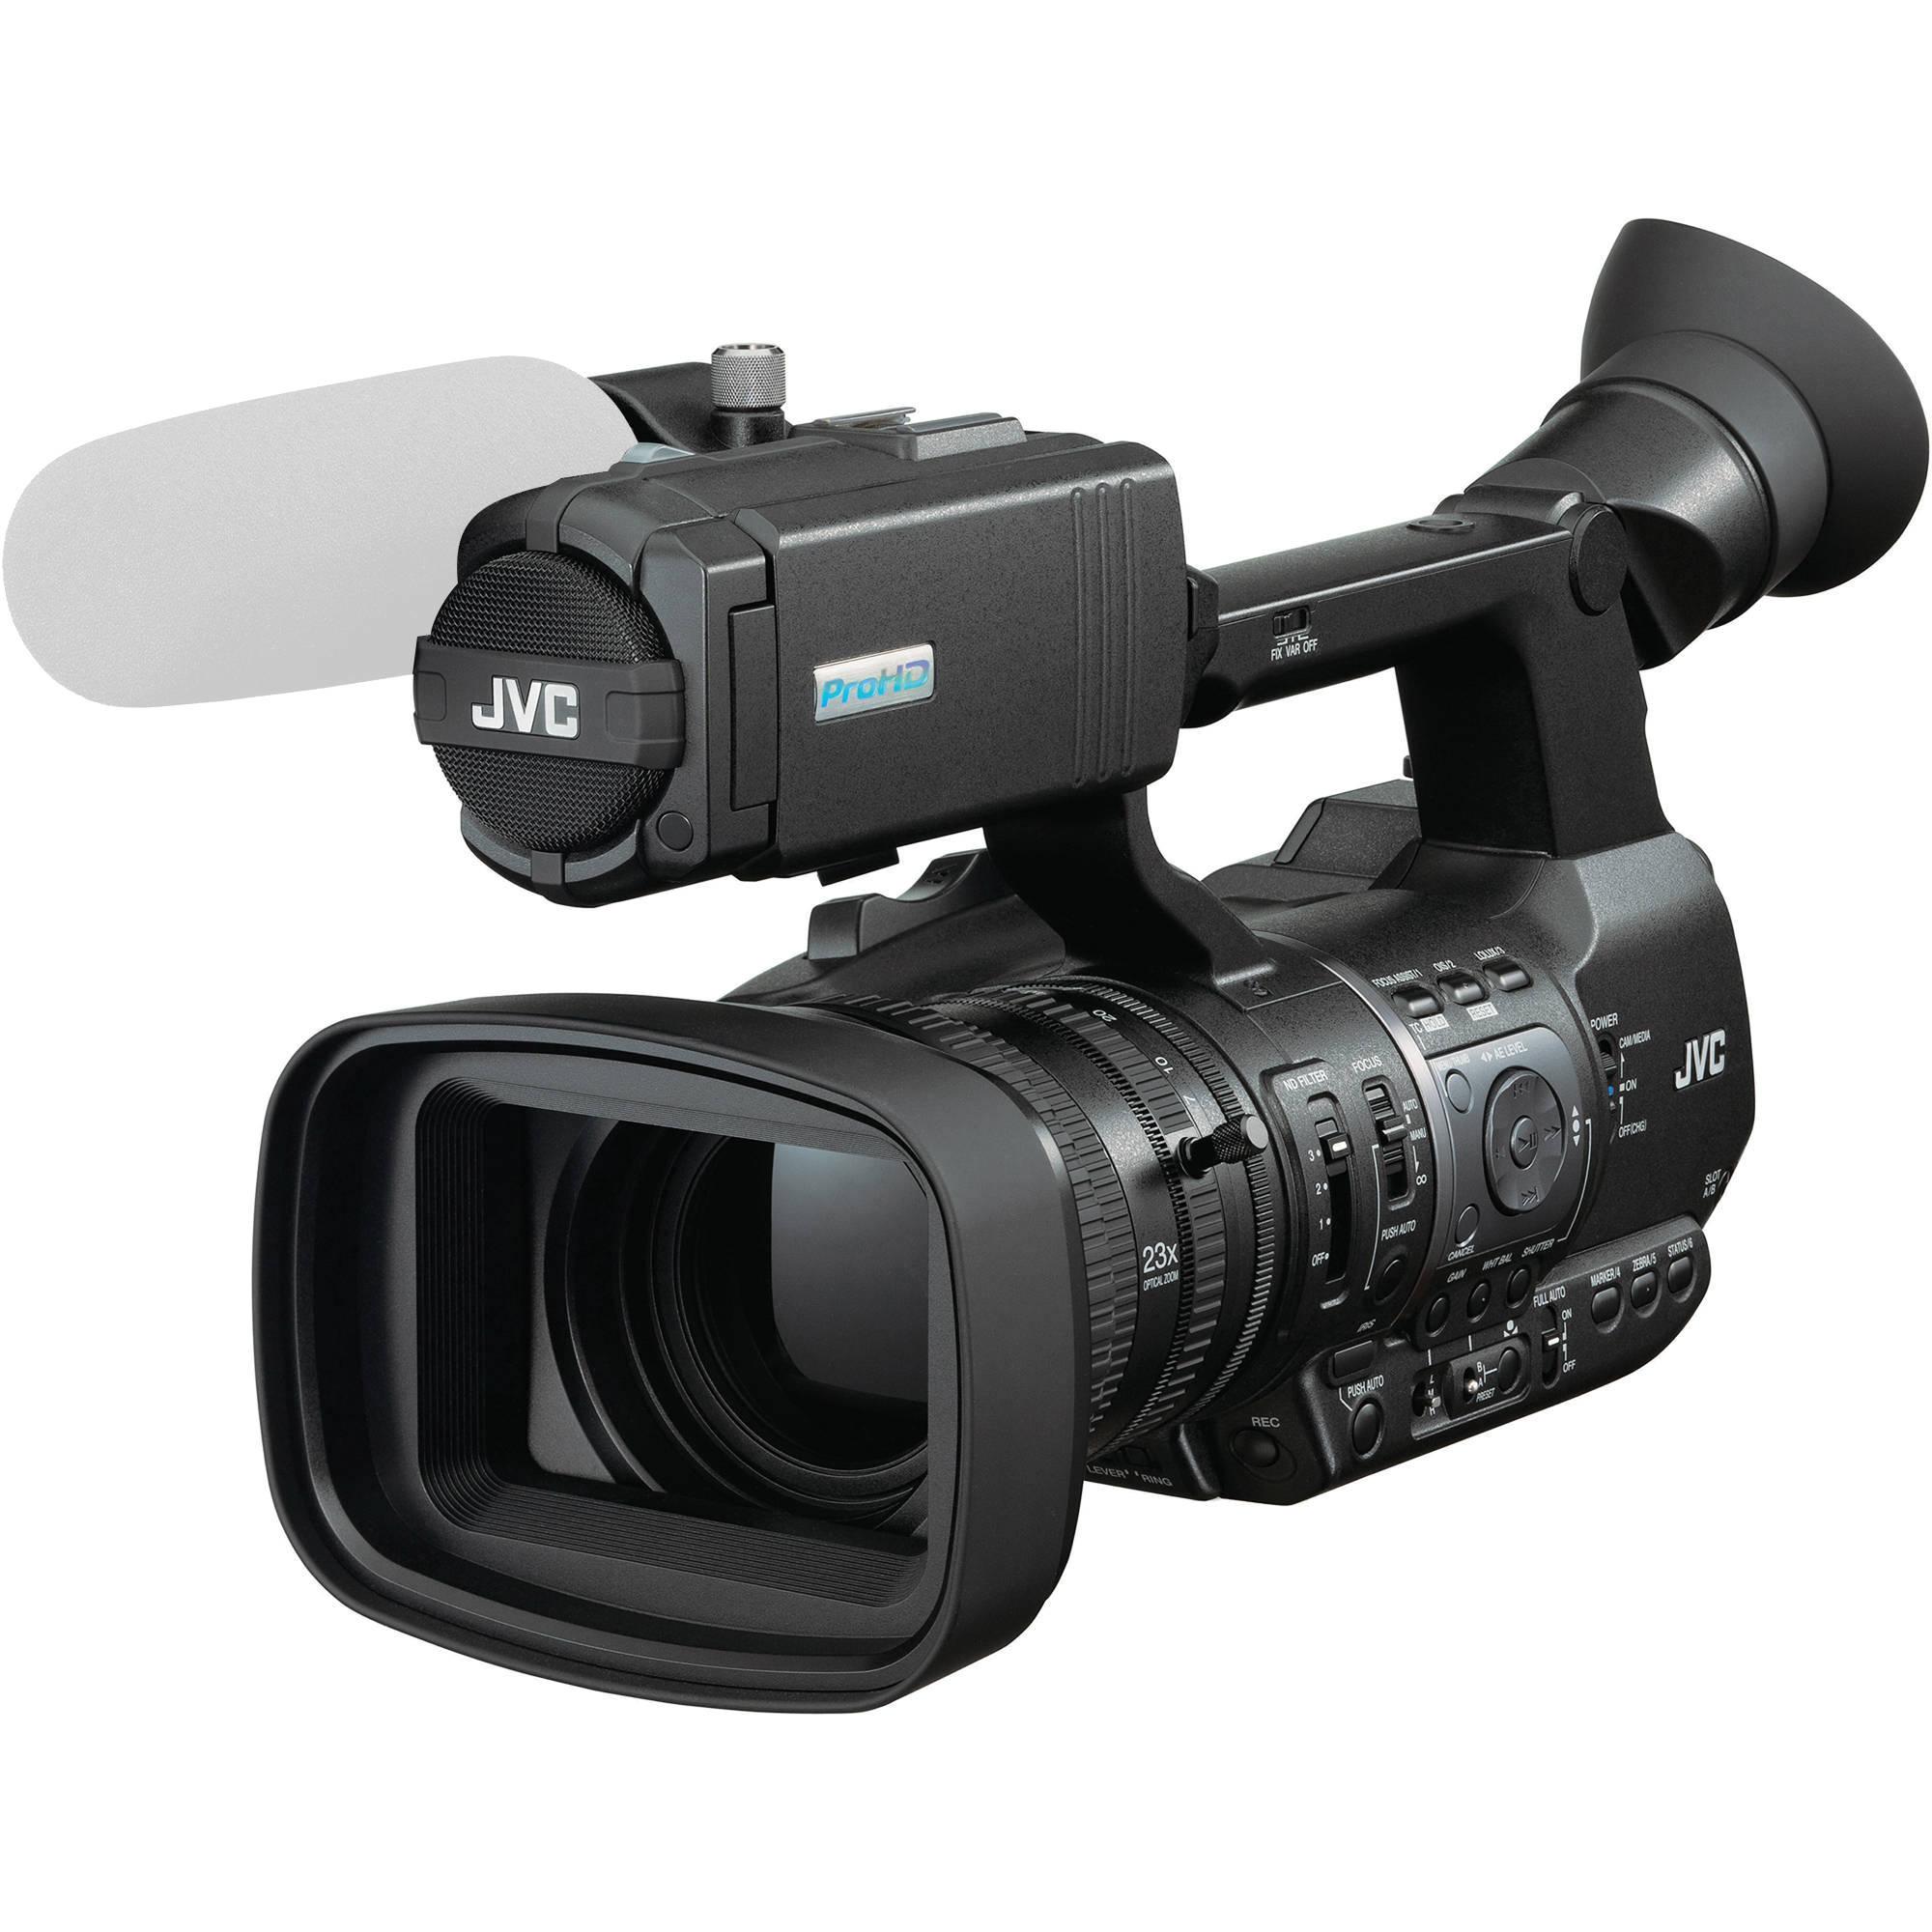 c product  REG JVC GY HMU HM ProHD Camcorder